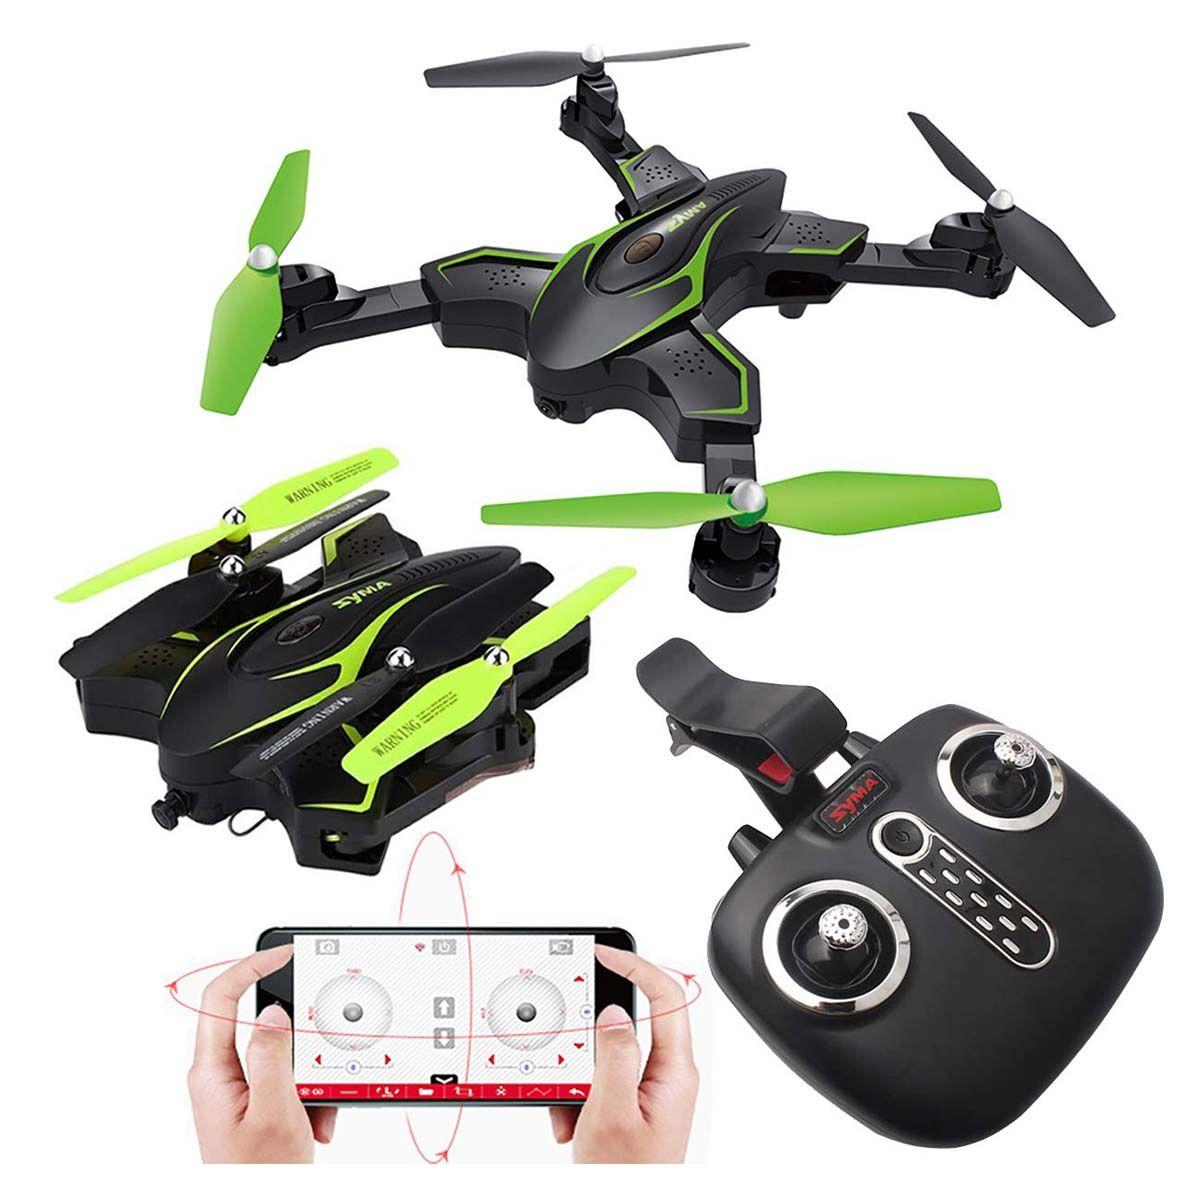 Kiditos Syma X56W-P Foldable Quadcopter Drone